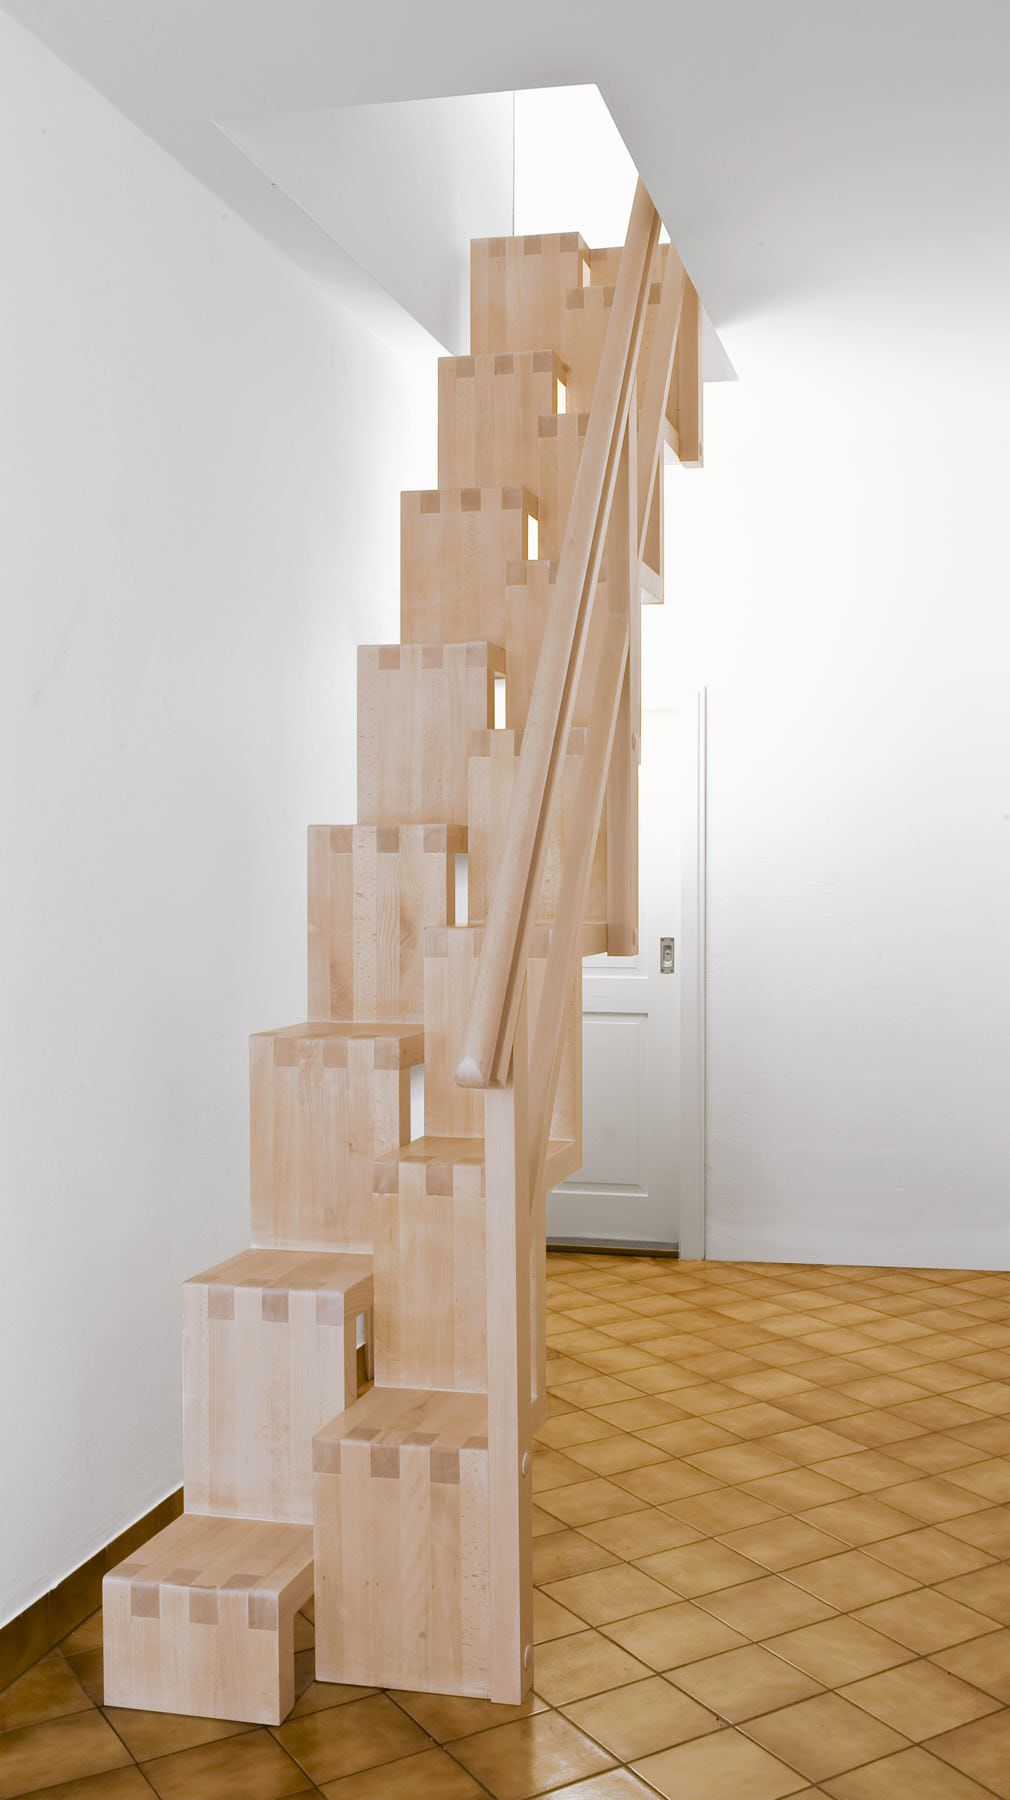 faltwerktreppe raumspartreppen in 2019 treppe dachboden treppe und spartreppe. Black Bedroom Furniture Sets. Home Design Ideas